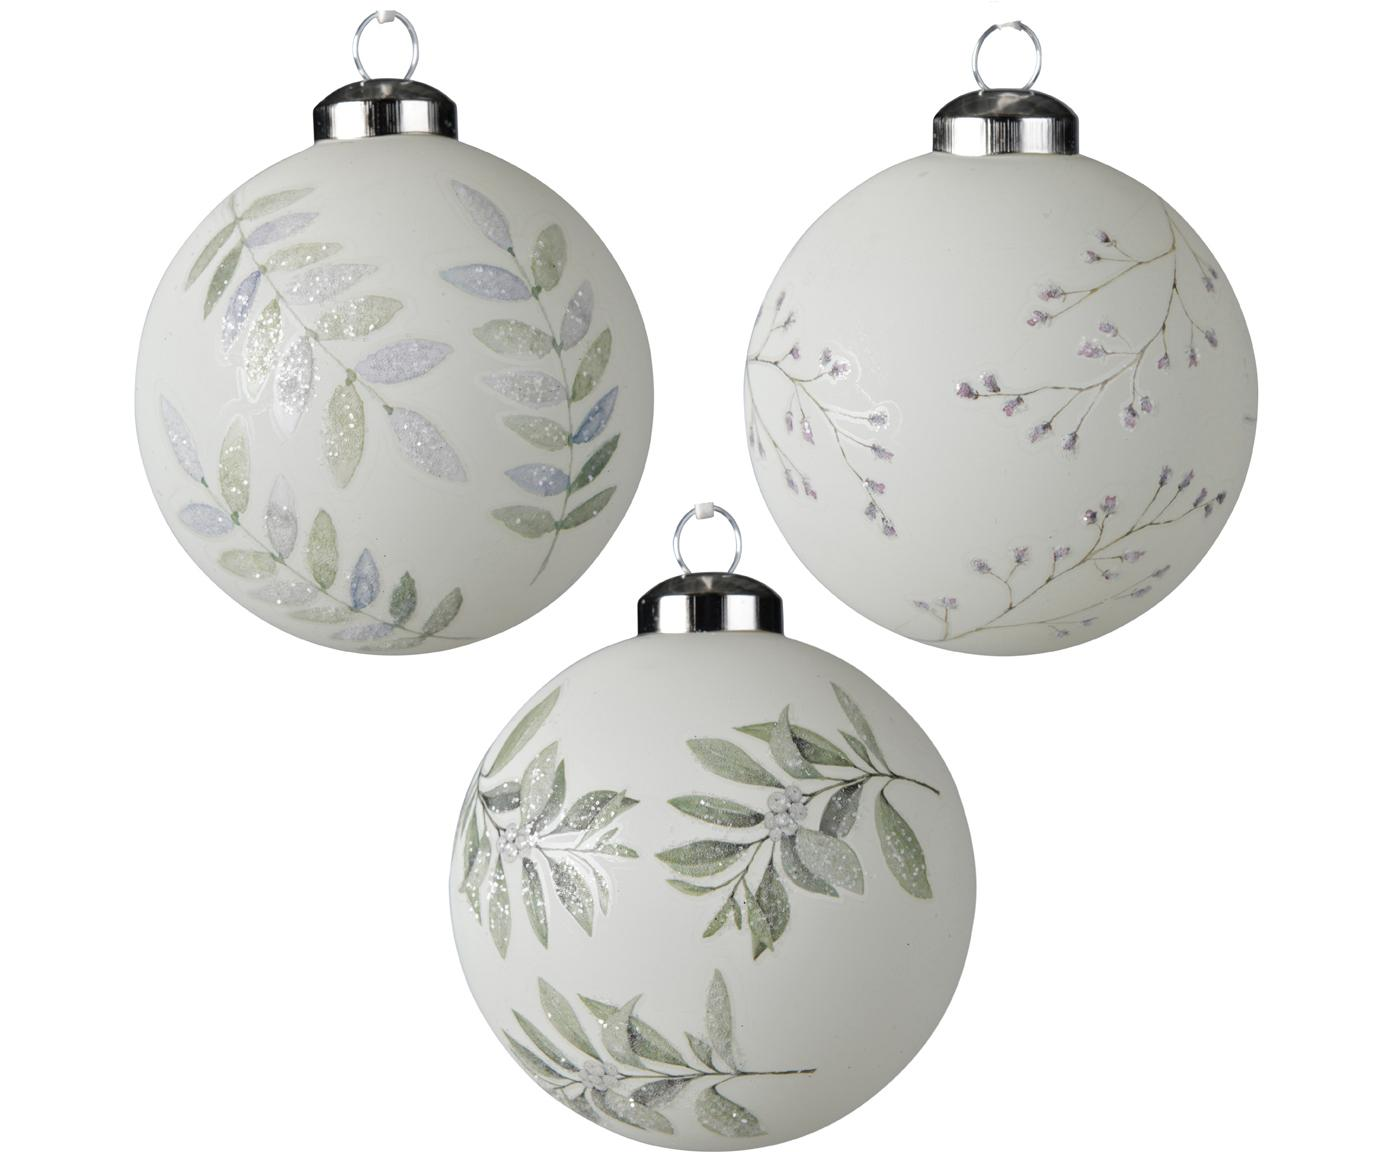 Kerstballenset Lilian, 3-delig, Glas, Wit, grijs, Ø 8 cm